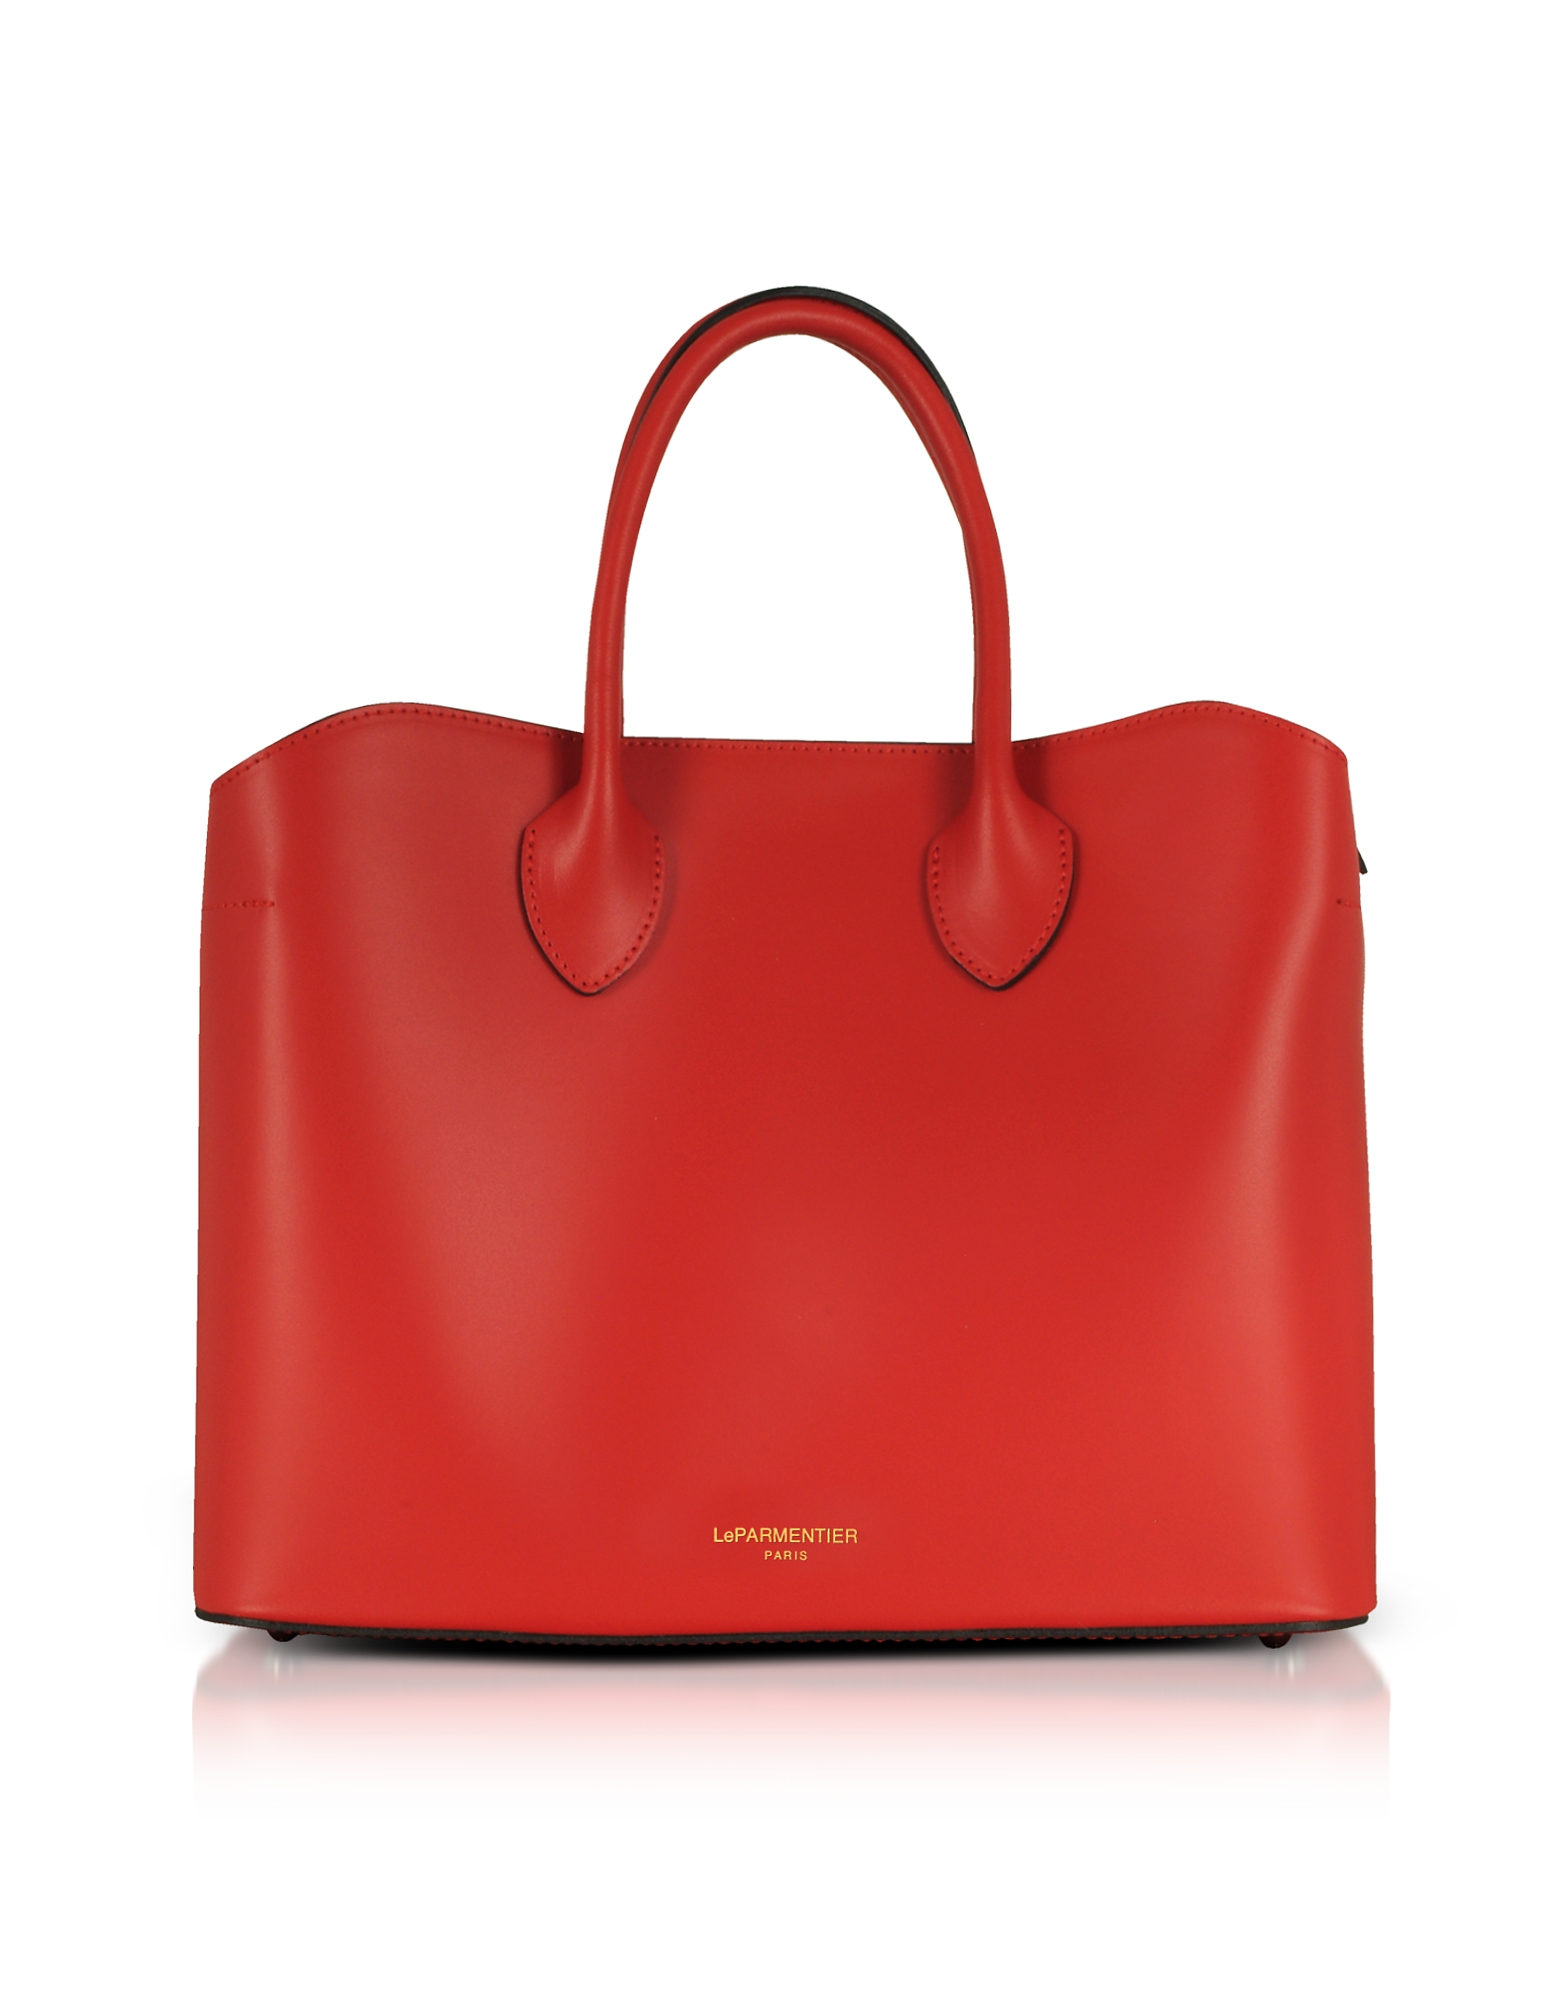 Le Parmentier Designer Handbags, Jackie Leather Tote Bag